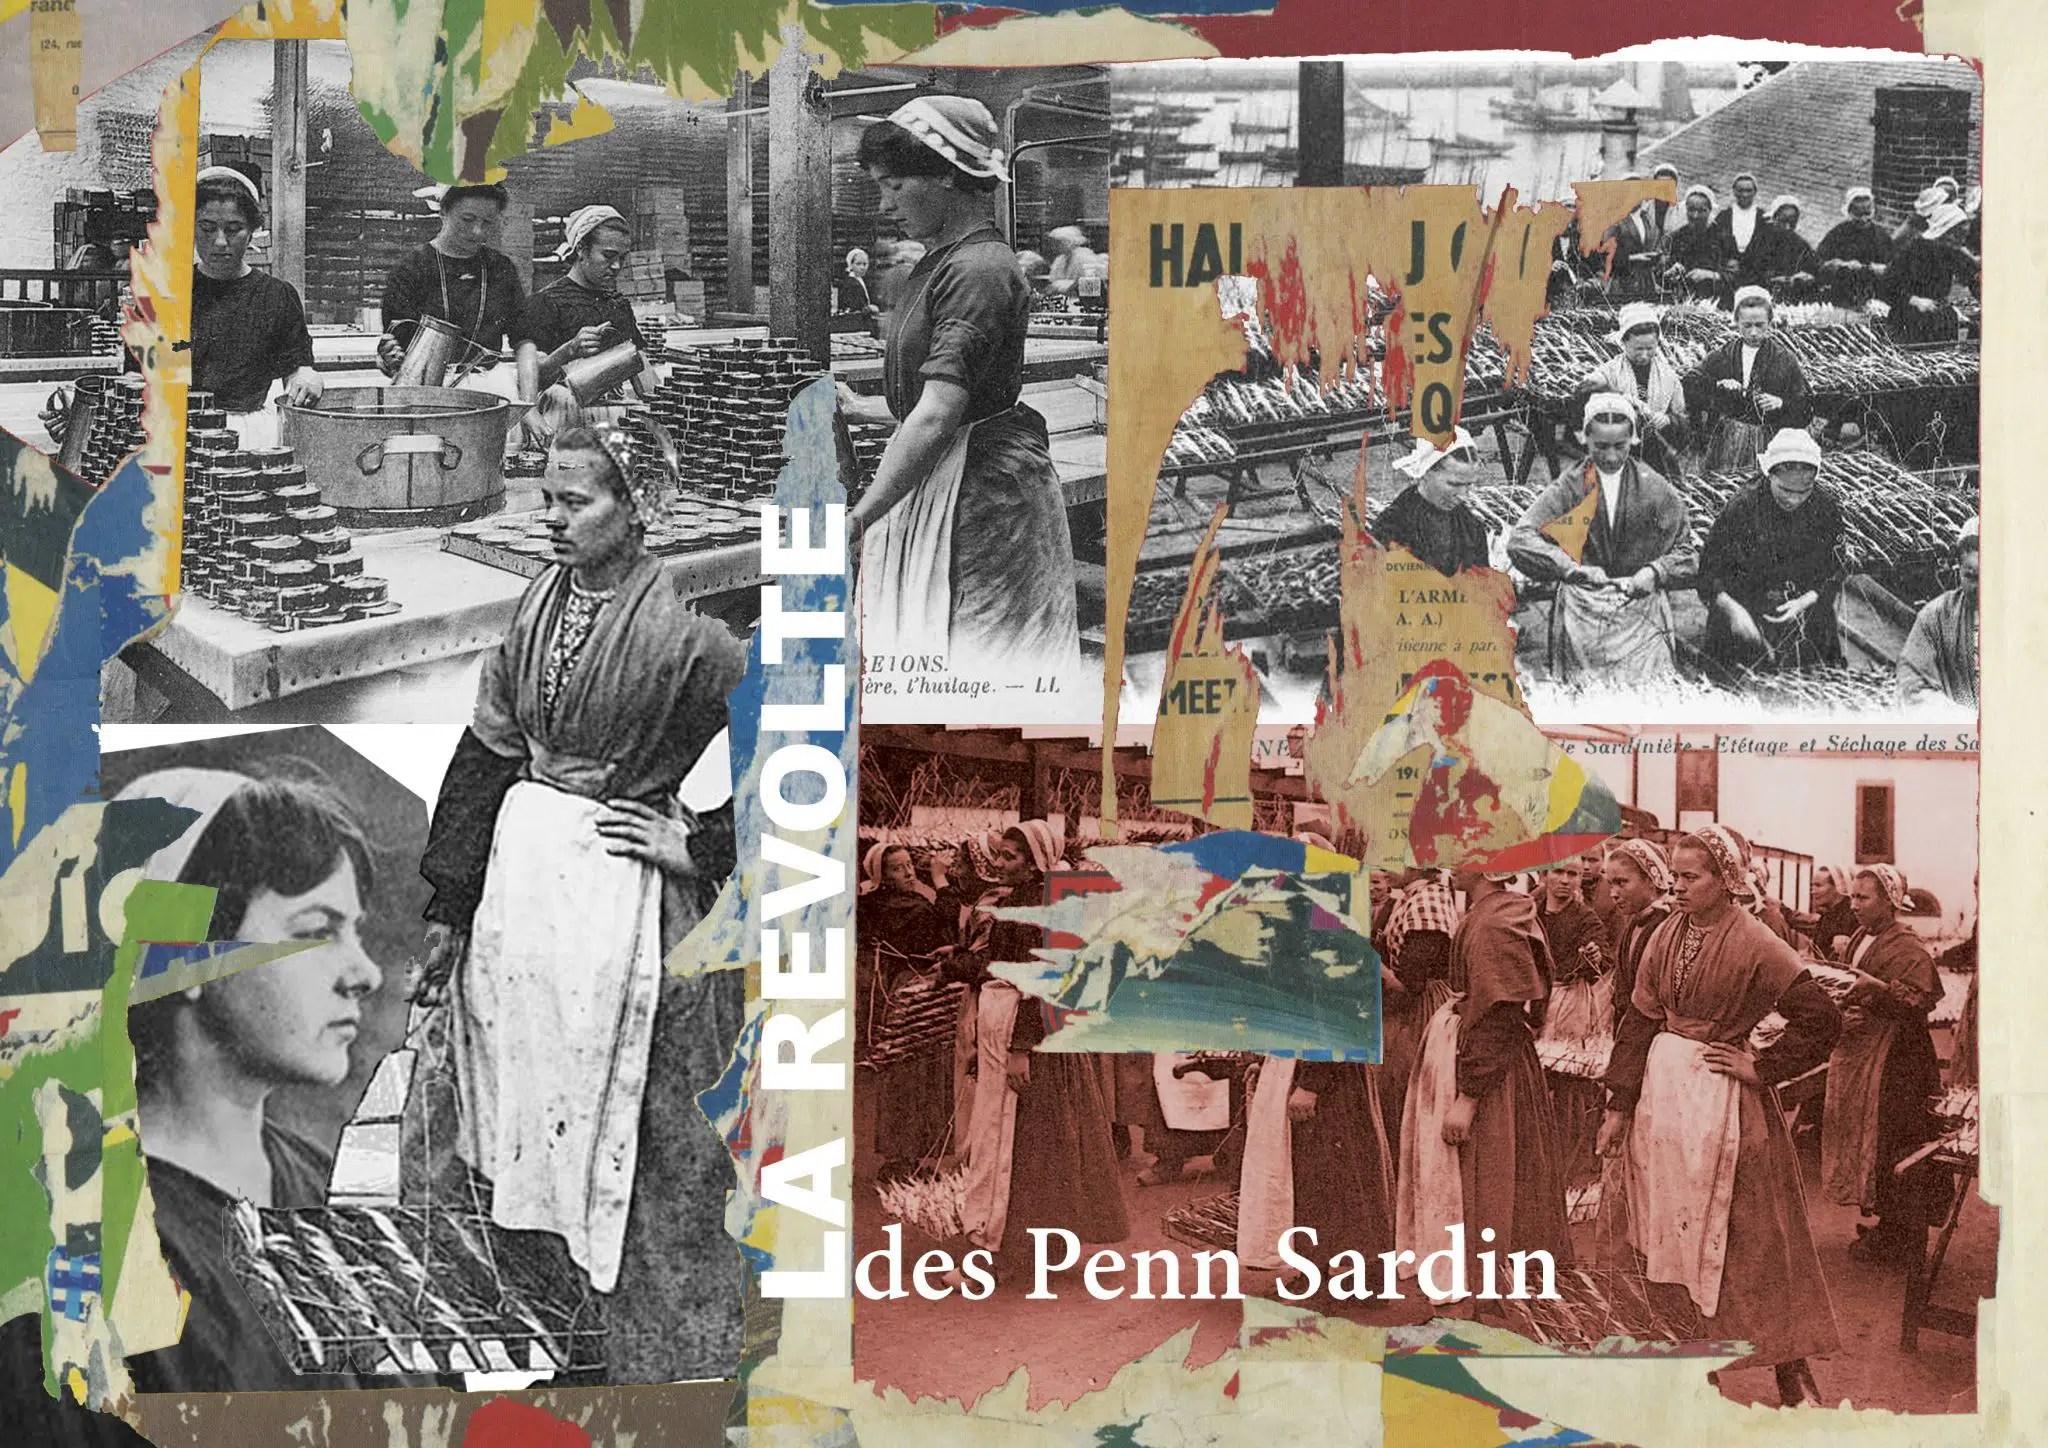 révolte-pen-sardin-sardines-douarnenez-pêche-grève-syndicat